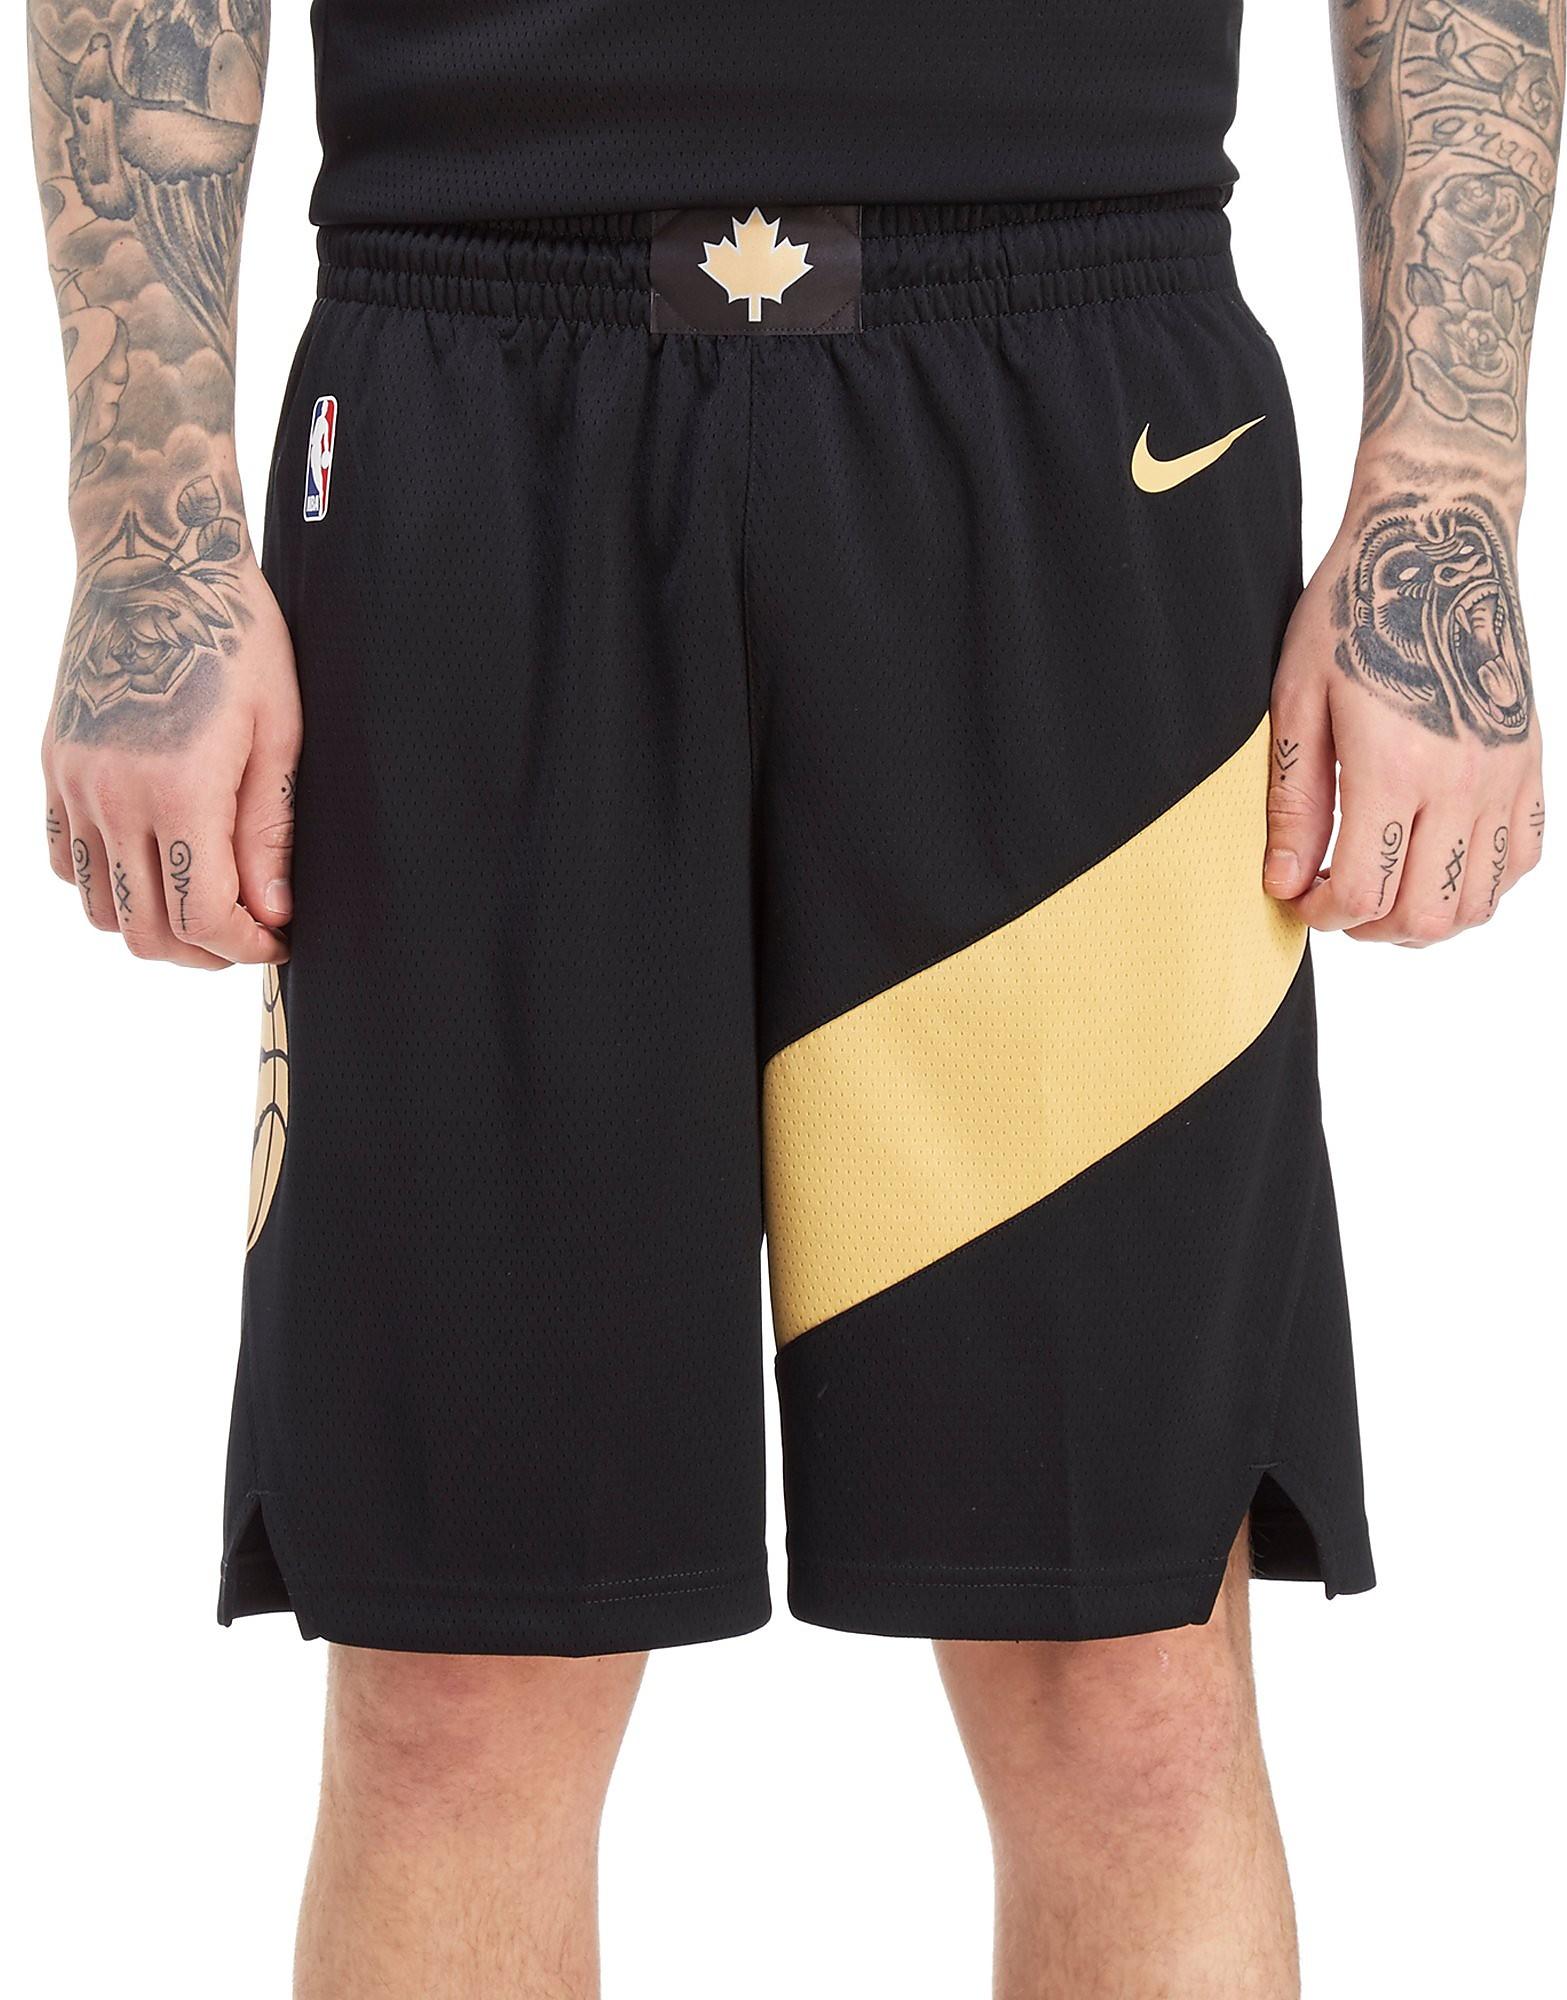 Nike NBA Toronto Raptors City Shorts